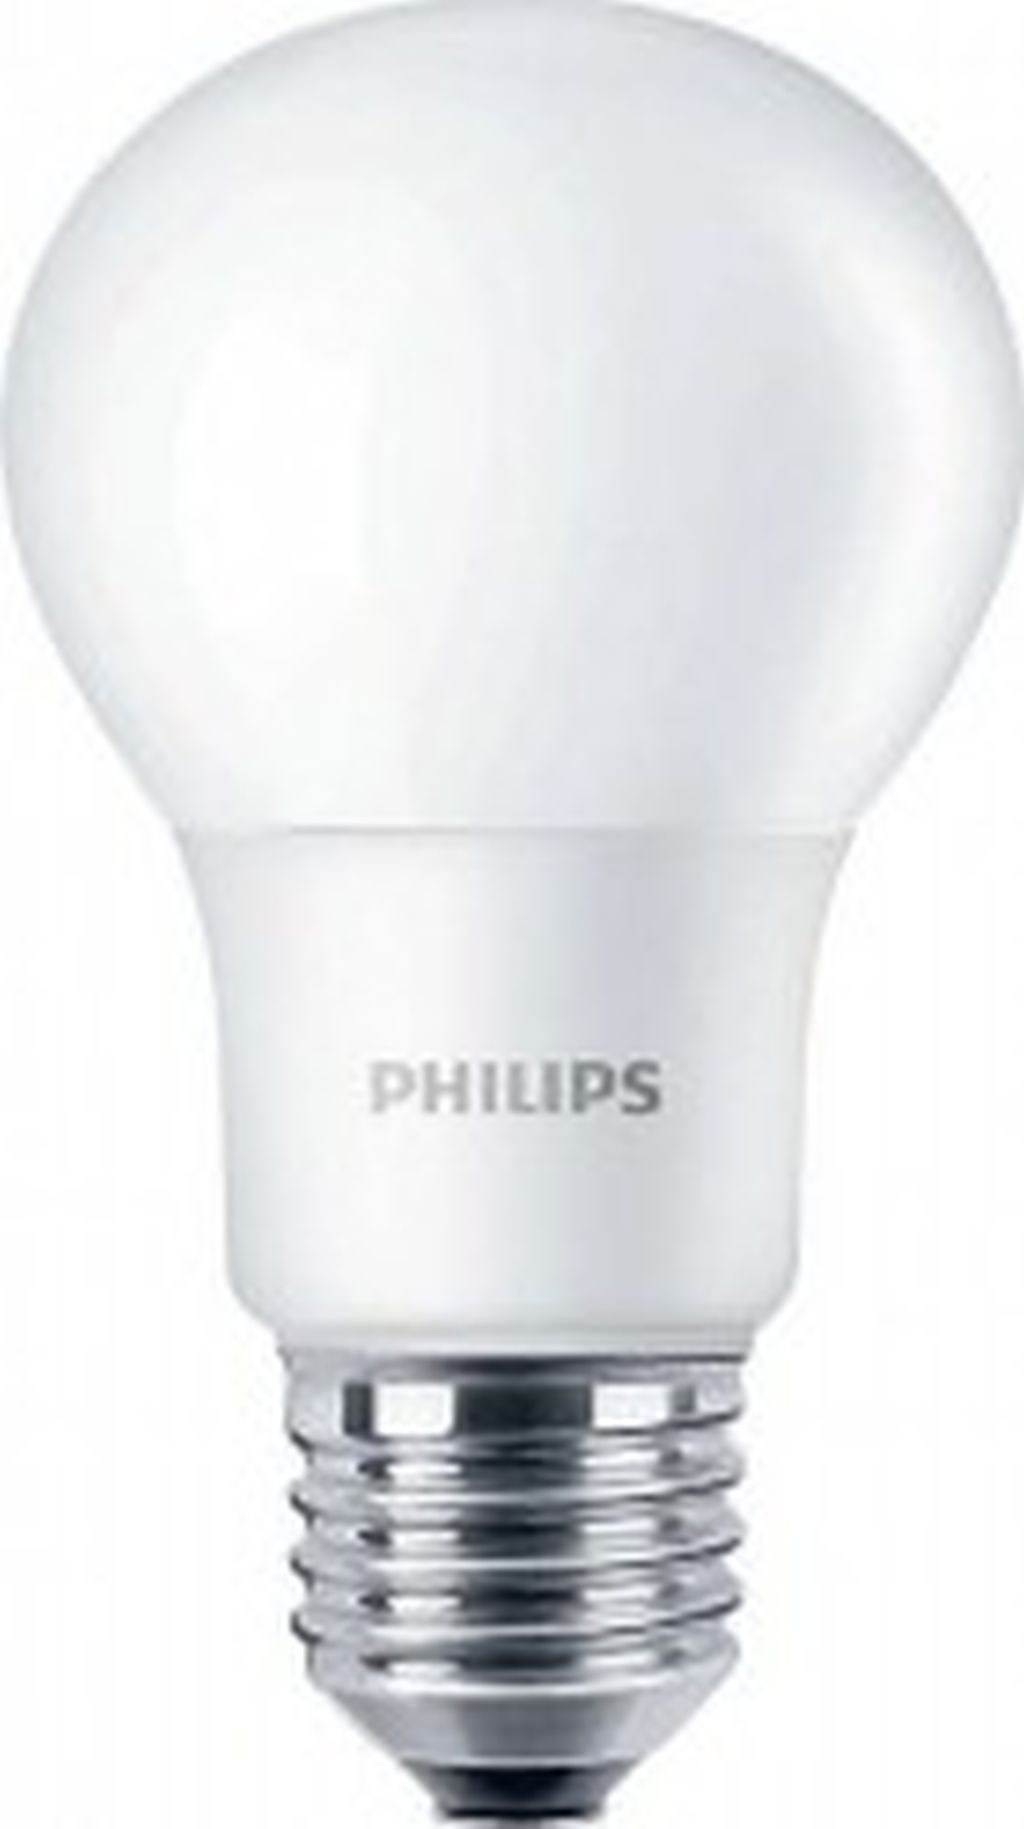 PHILIPS COREPRO LEDbulb 13.5-100W E27 827 žárovka 8718696490747